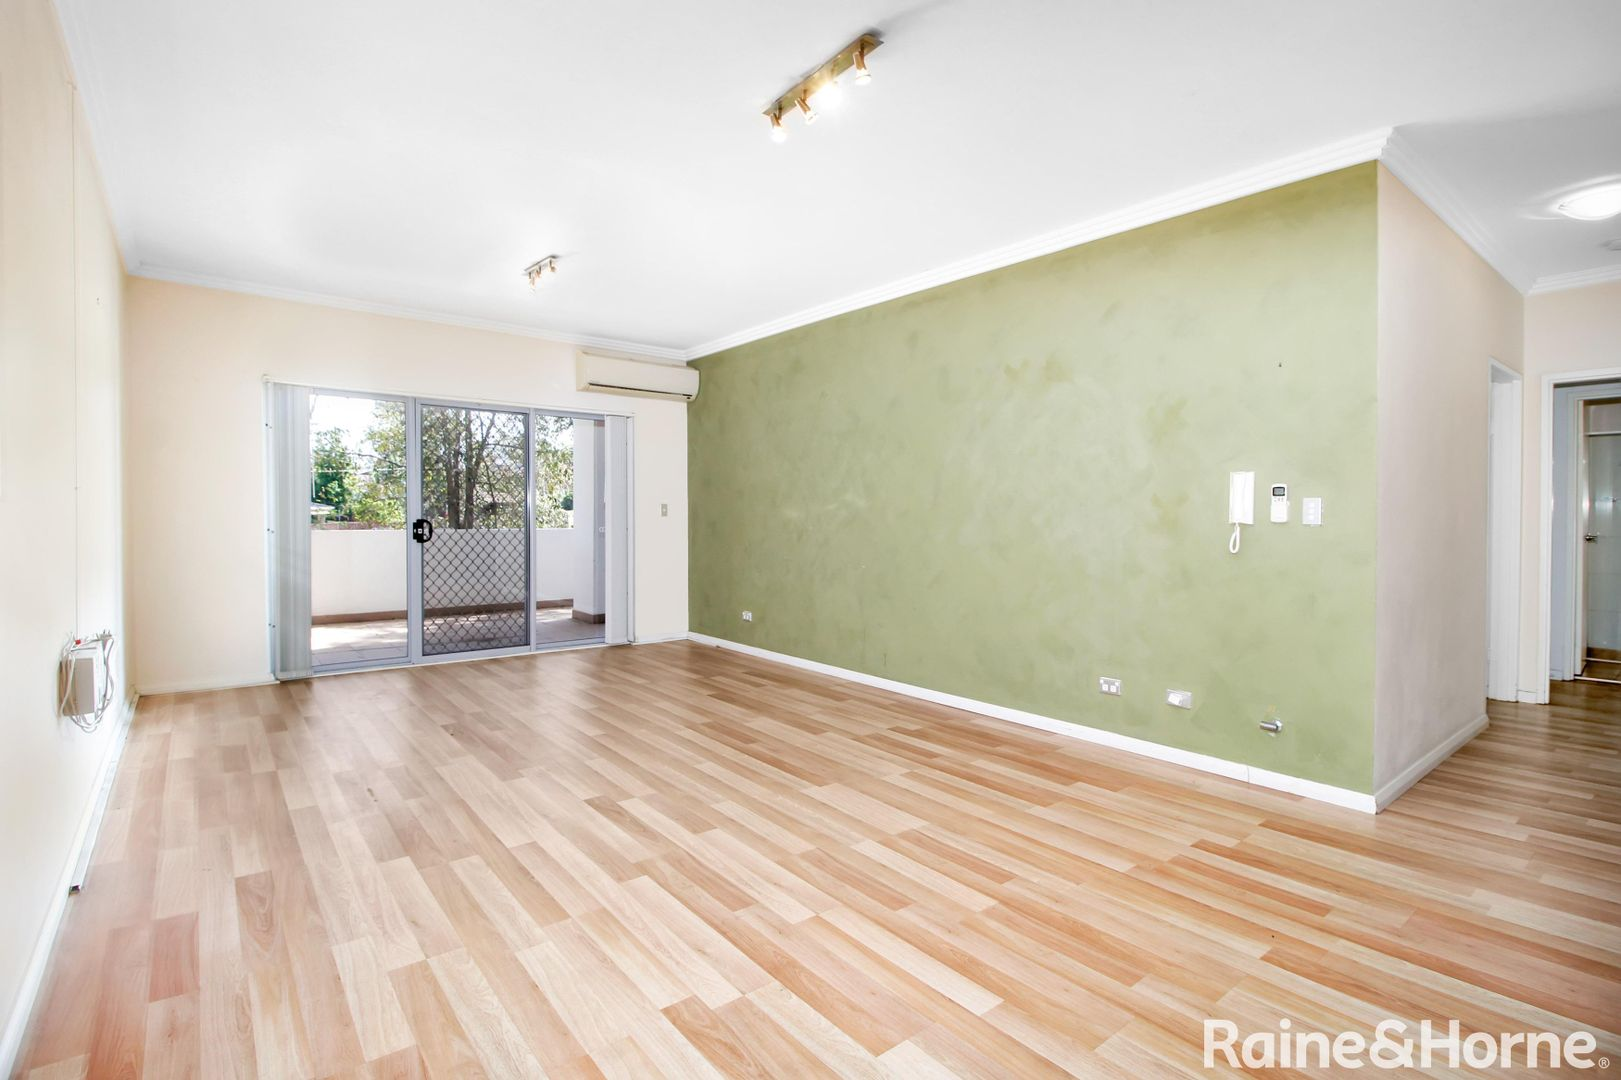 17/13-19 Robert Street, Penrith NSW 2750, Image 1